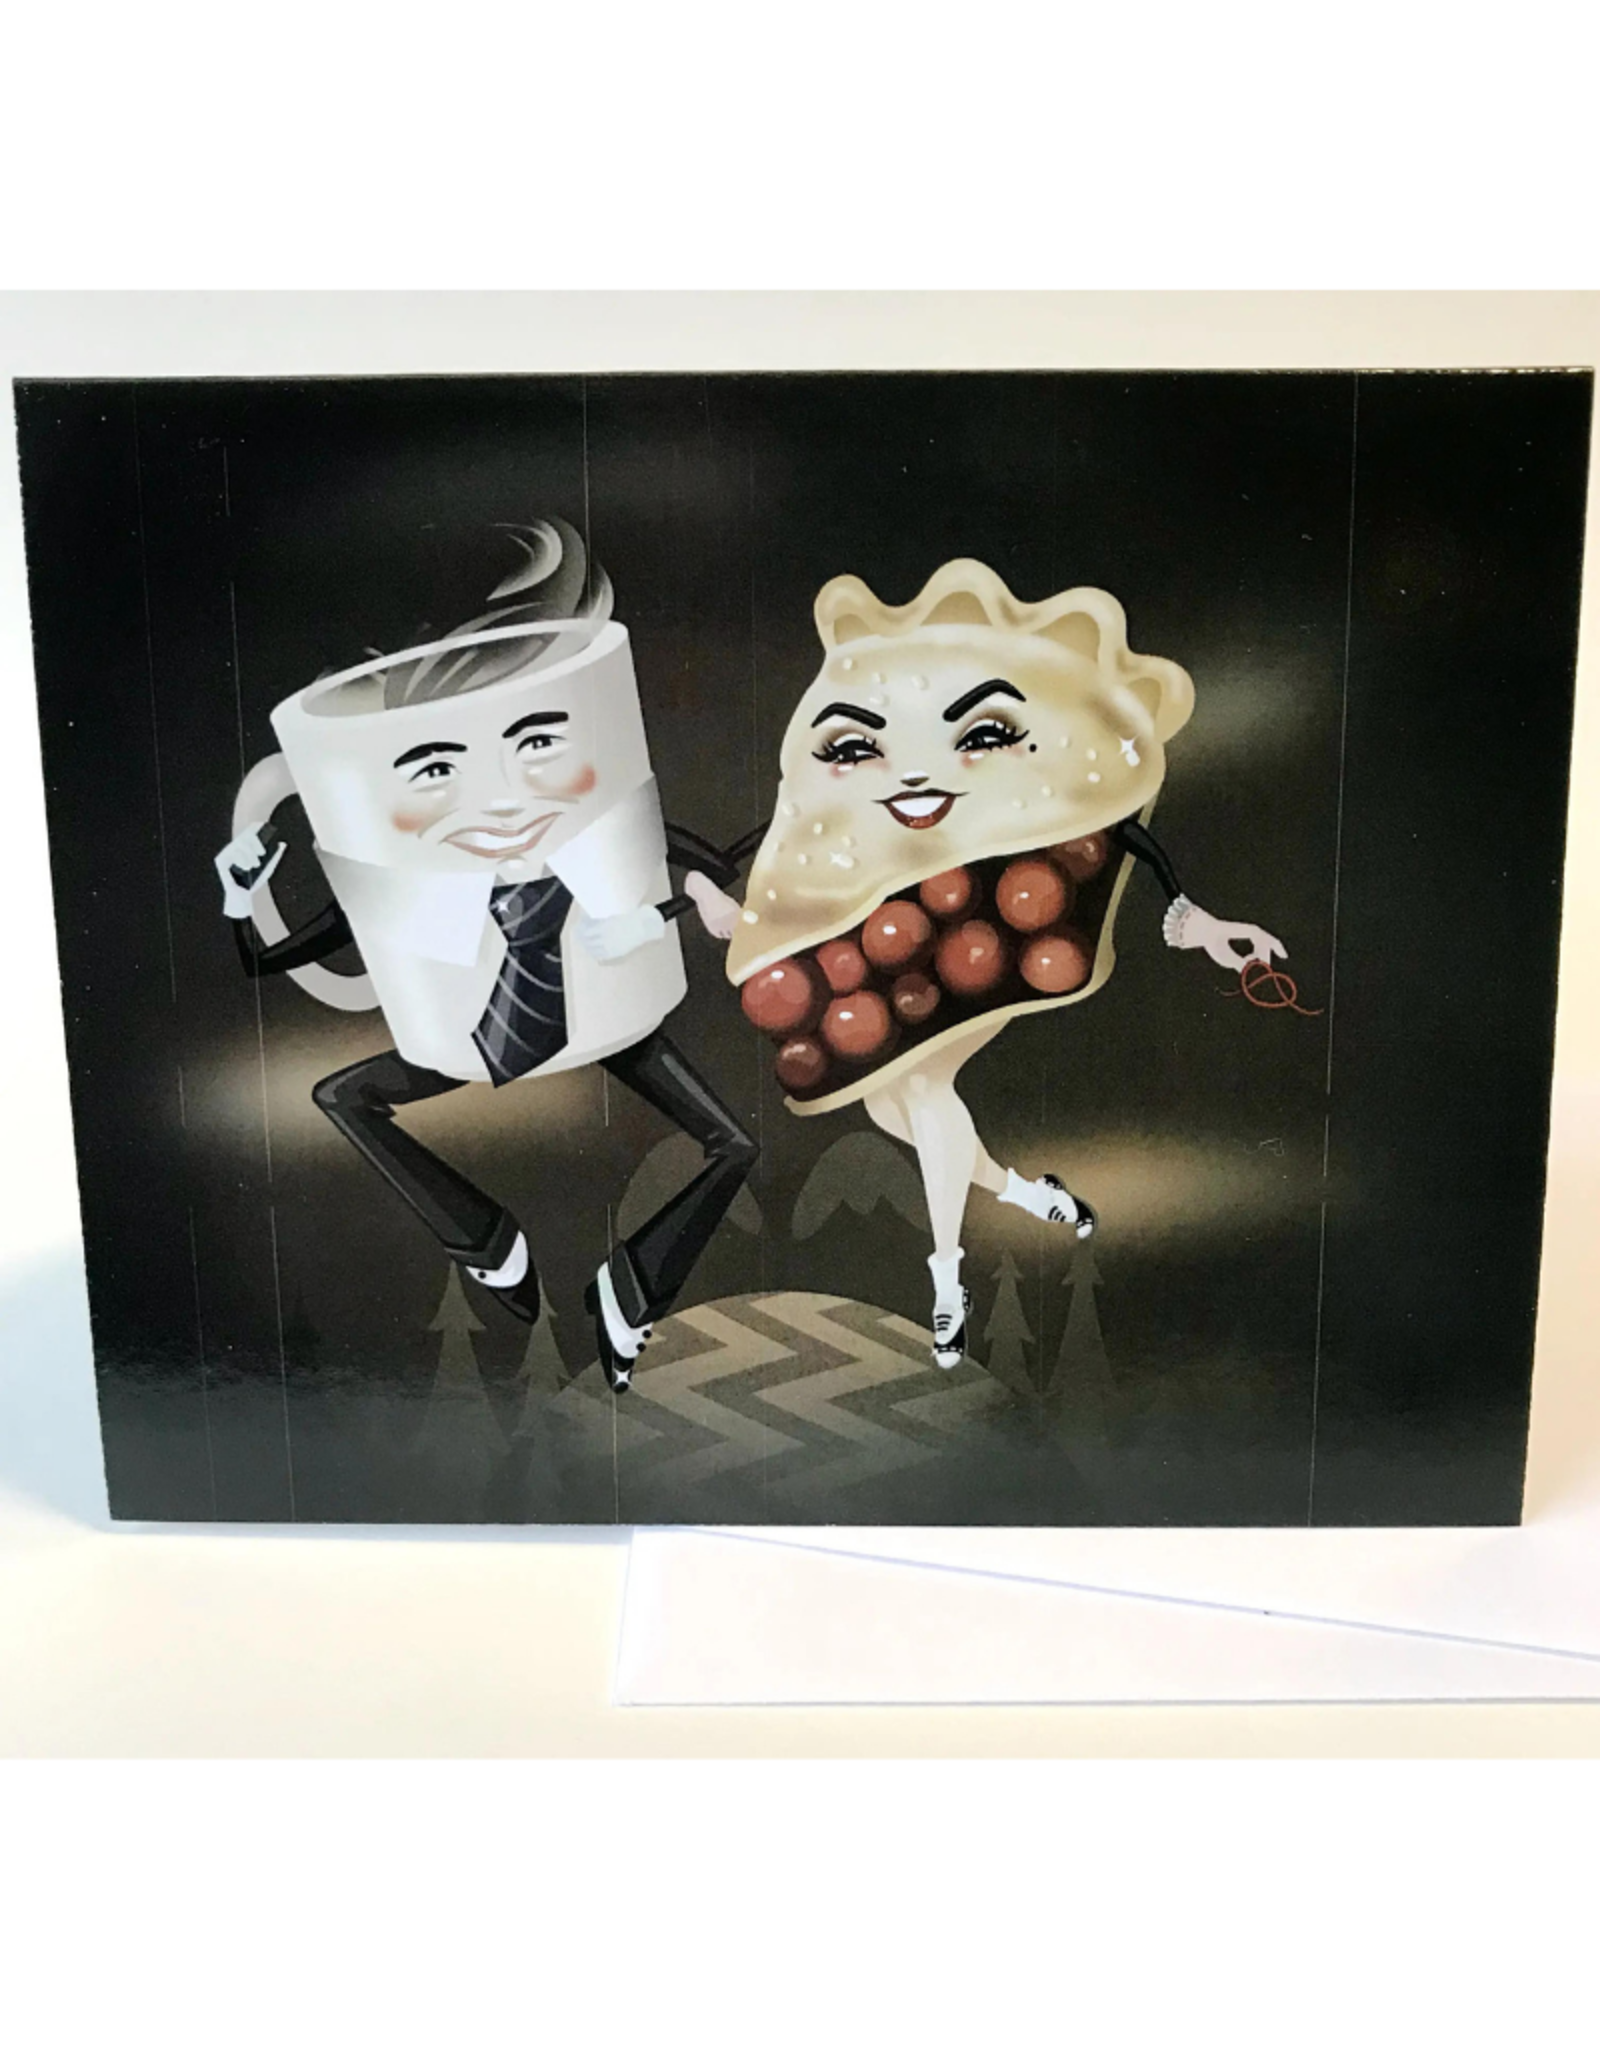 "Faire/Kitschy Delish CARD-BLANK ""DAMN FINE"""